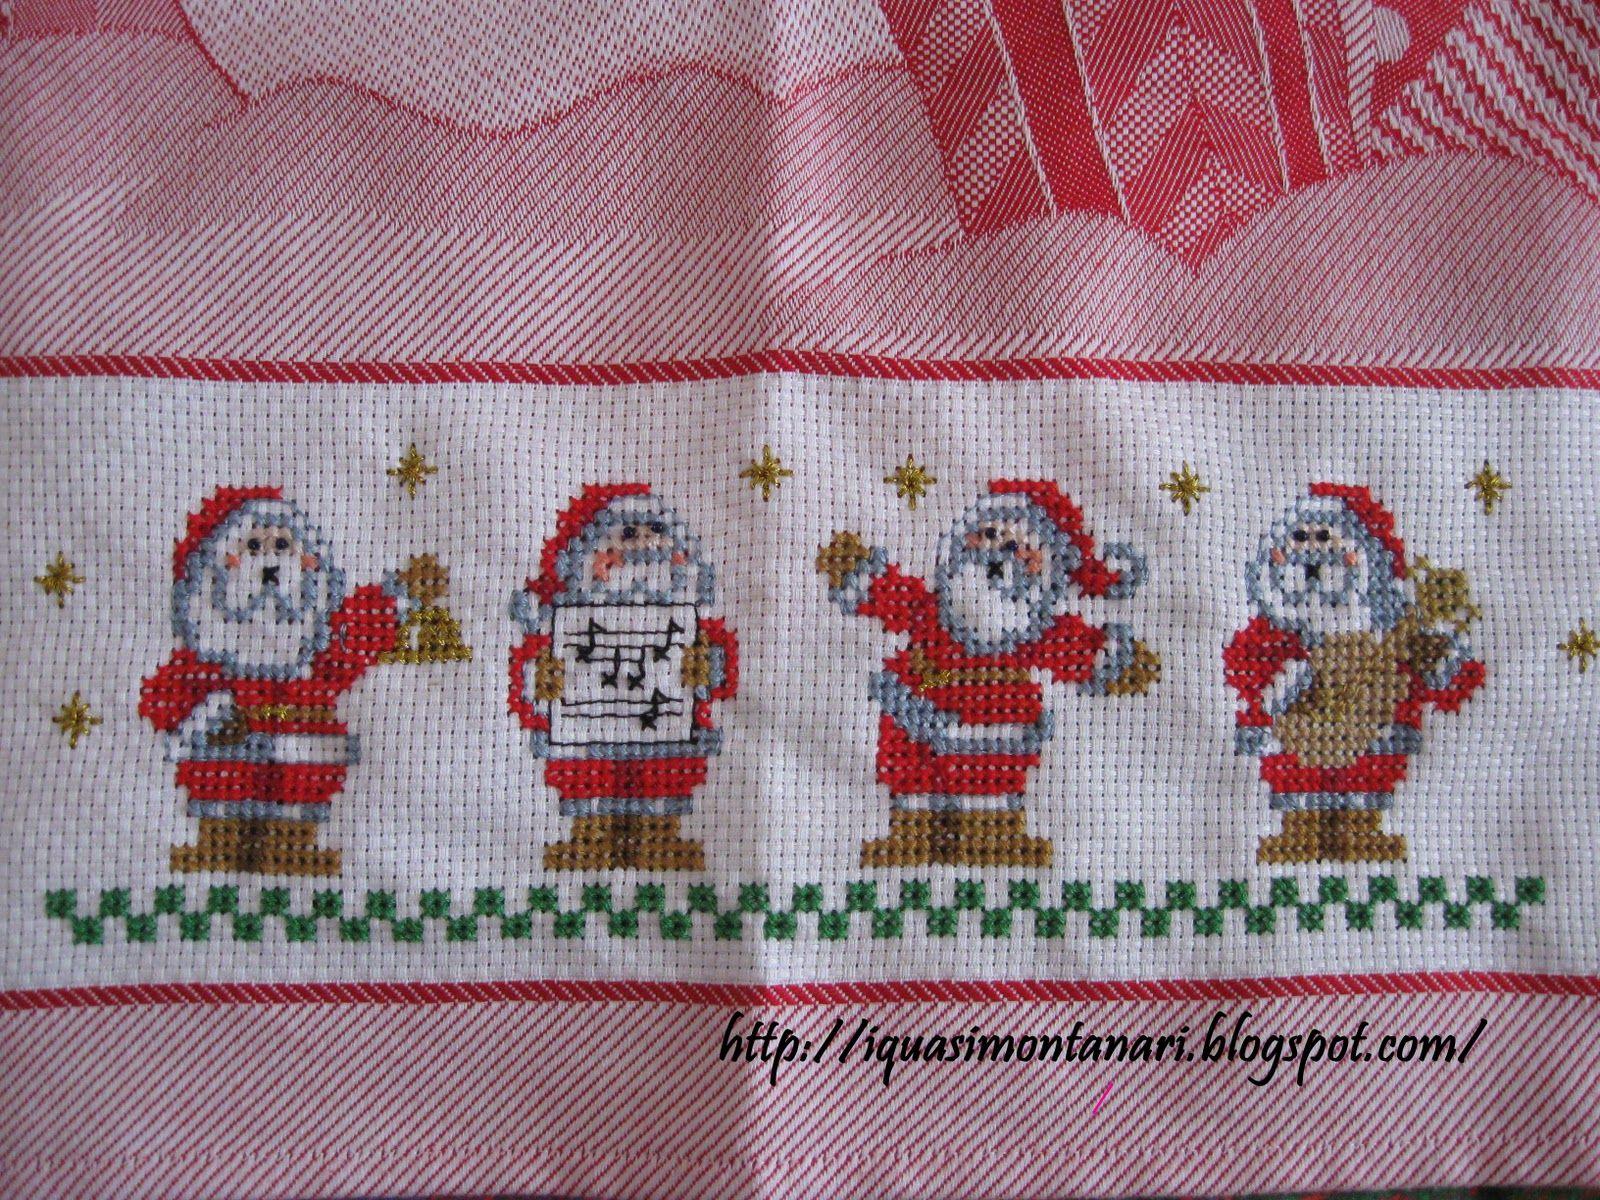 Babbo Natale Punto Croce Schemi Gratis.Tovaglie Punto Croce Schemi Gratis Piccoli Babbo Natale Su